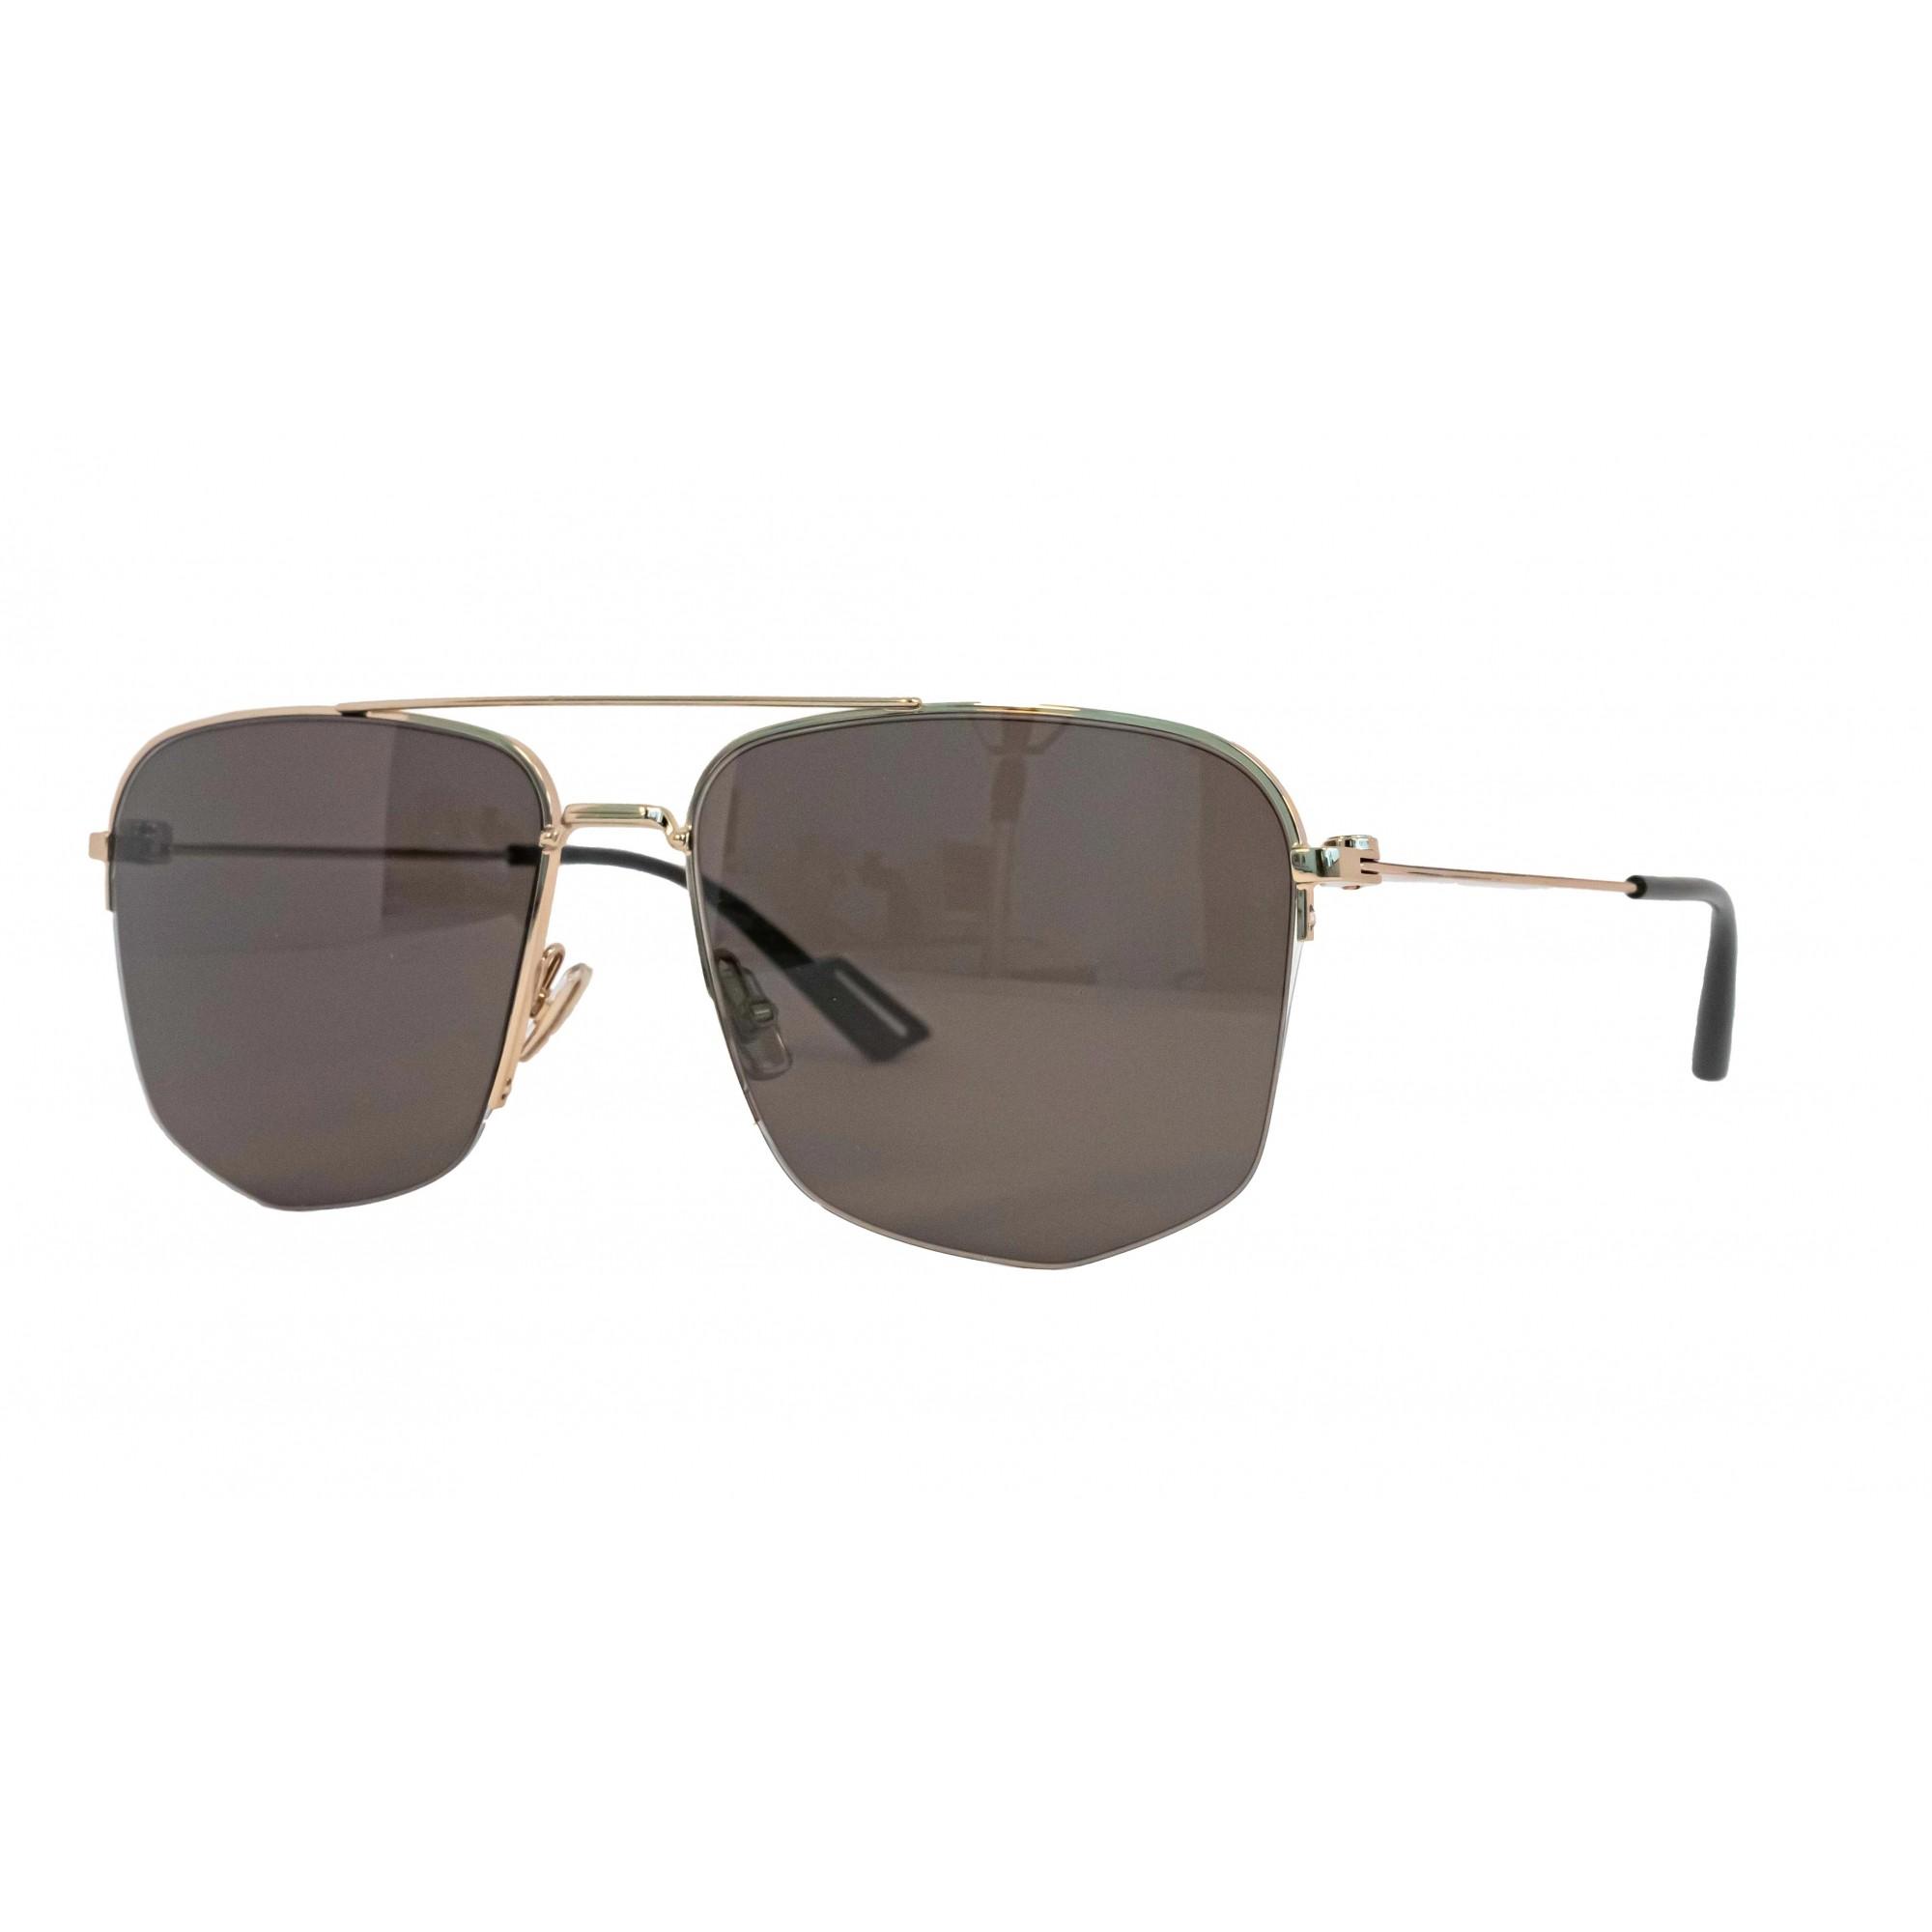 Óculos Dior Aviador Bydior Rhlir Rhlir 60 Dourado